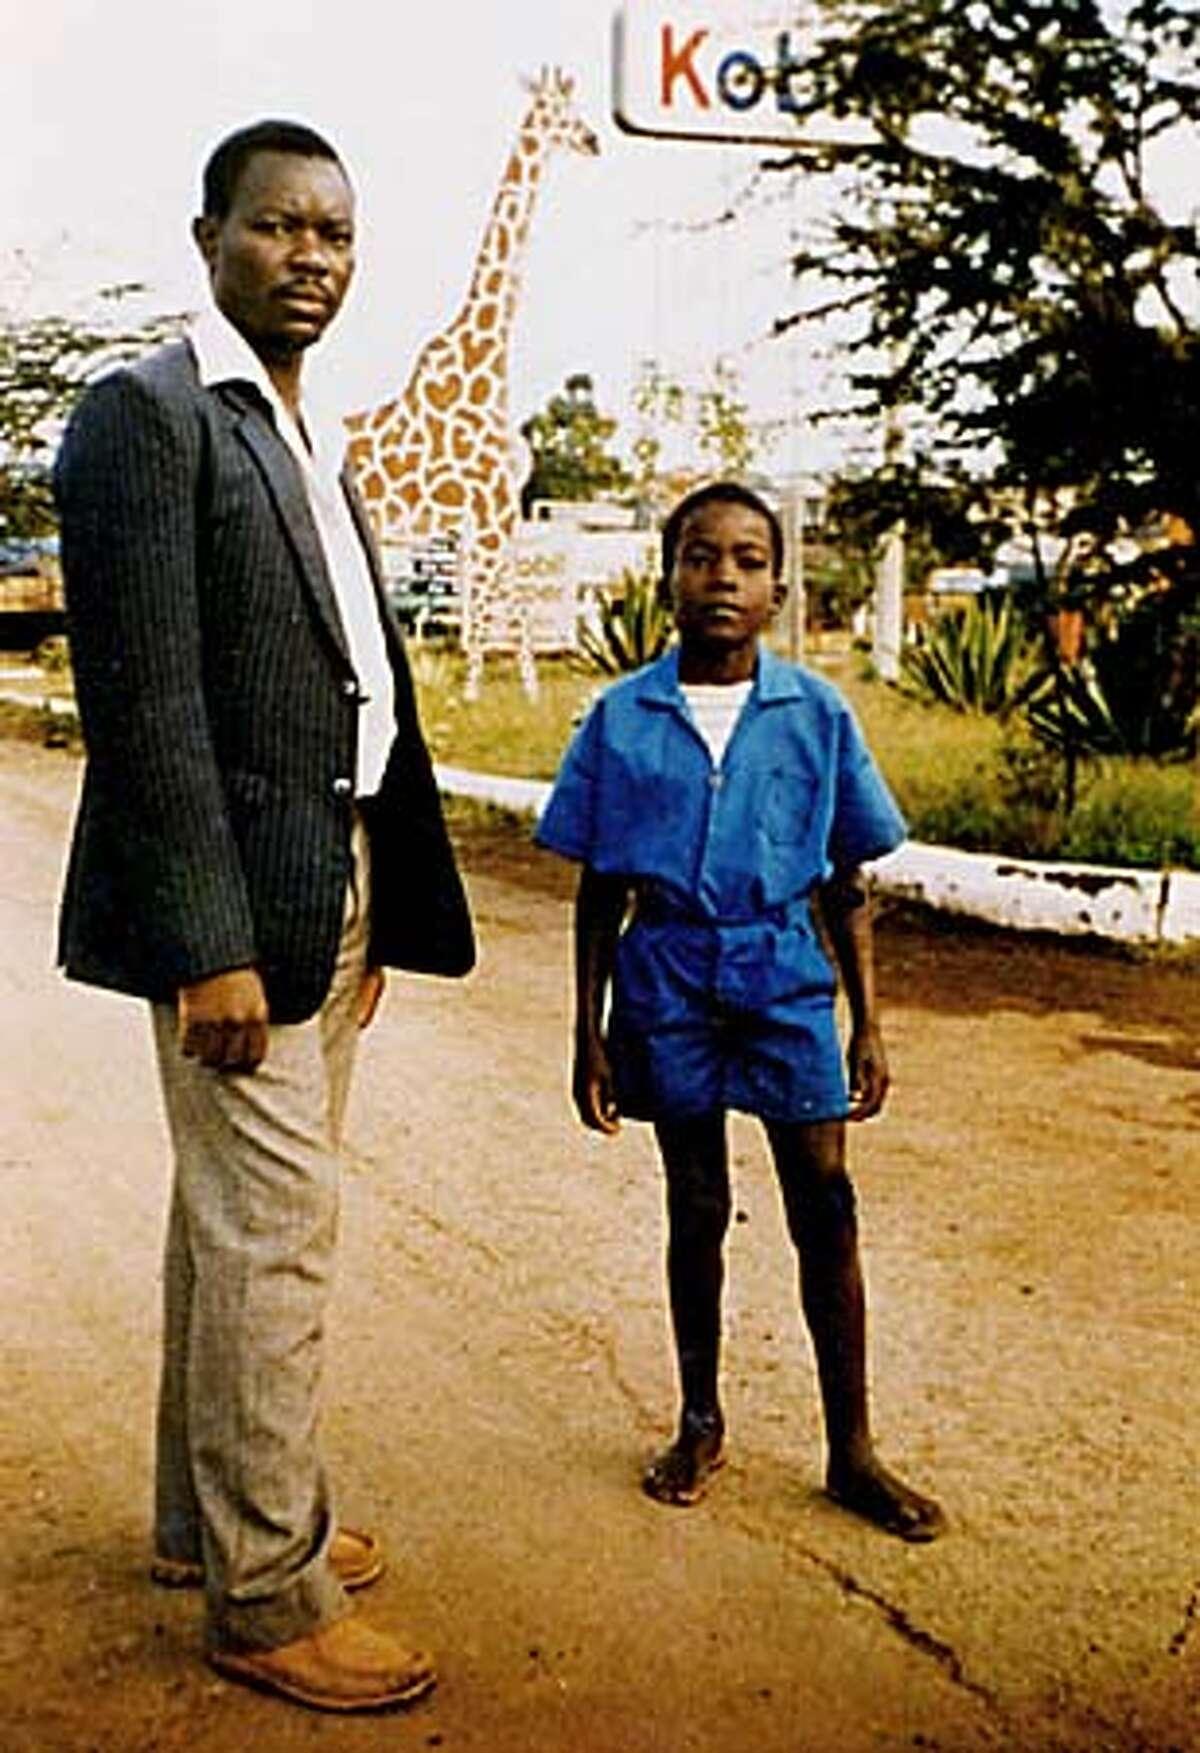 At age 10, Masai student Kimeli Naiyomah posed with his Kenyan primary school teacher S. Nyangeri.